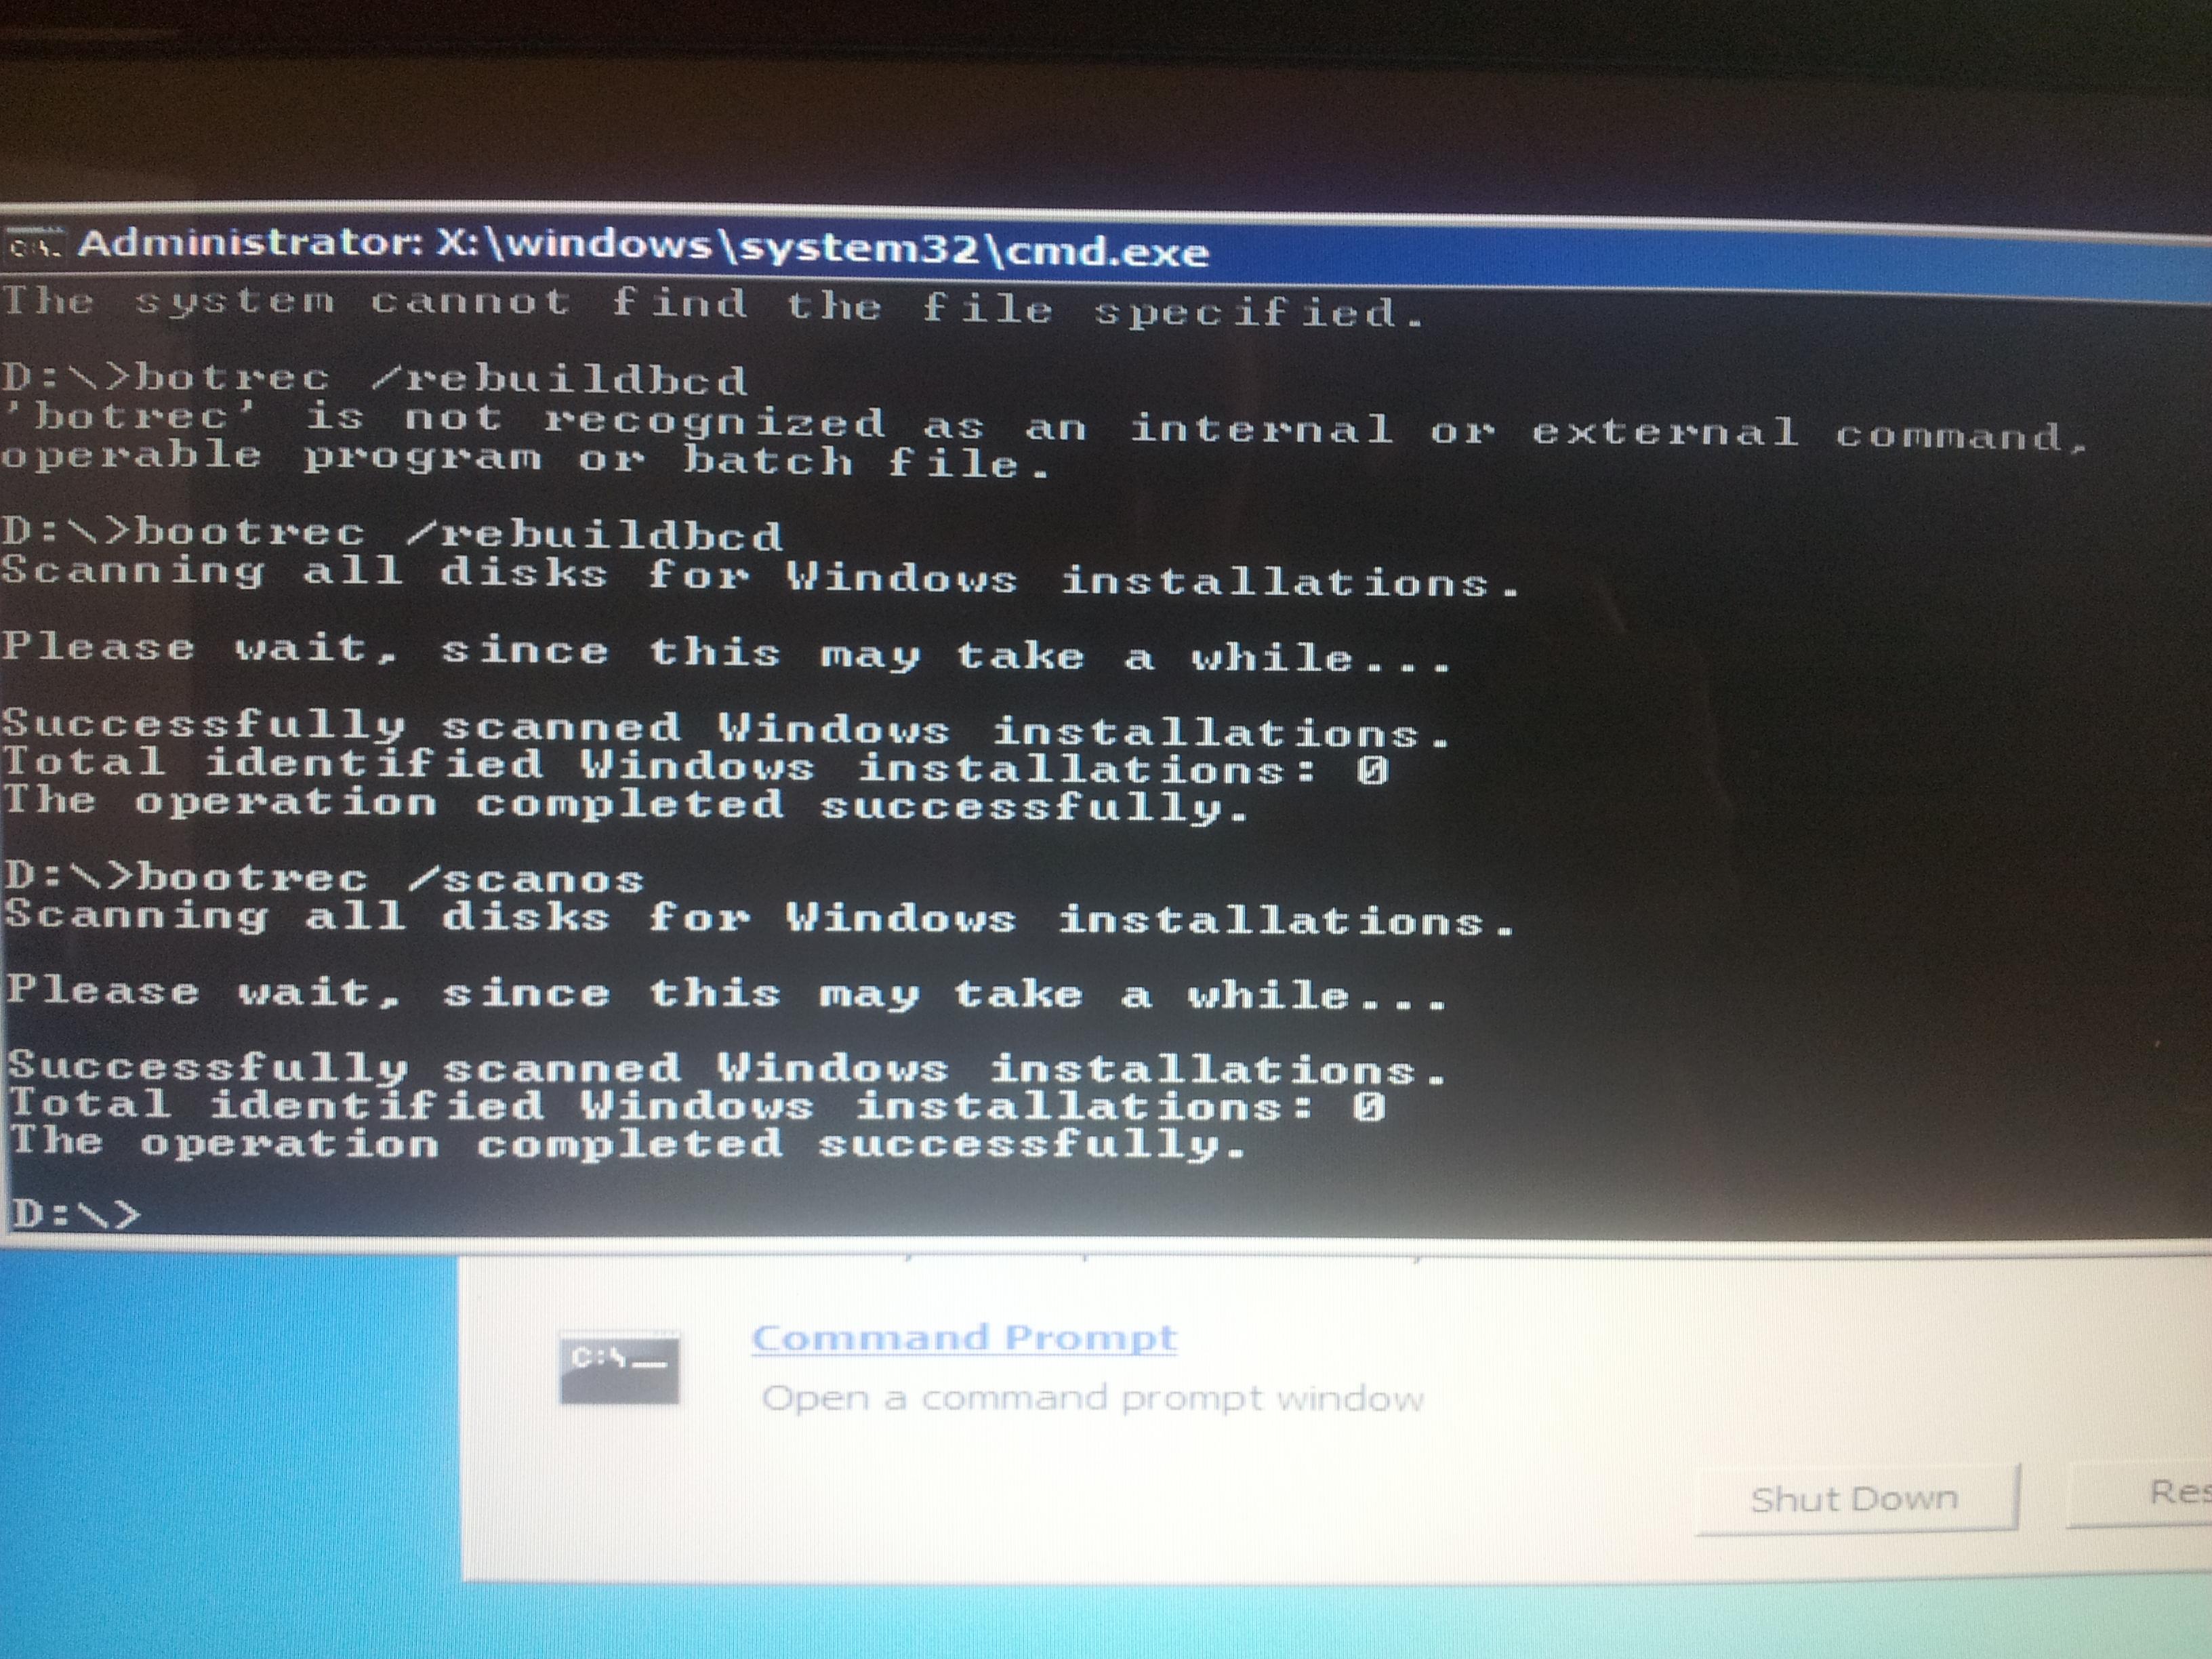 Bootrec Total Identified Windows Installations 0